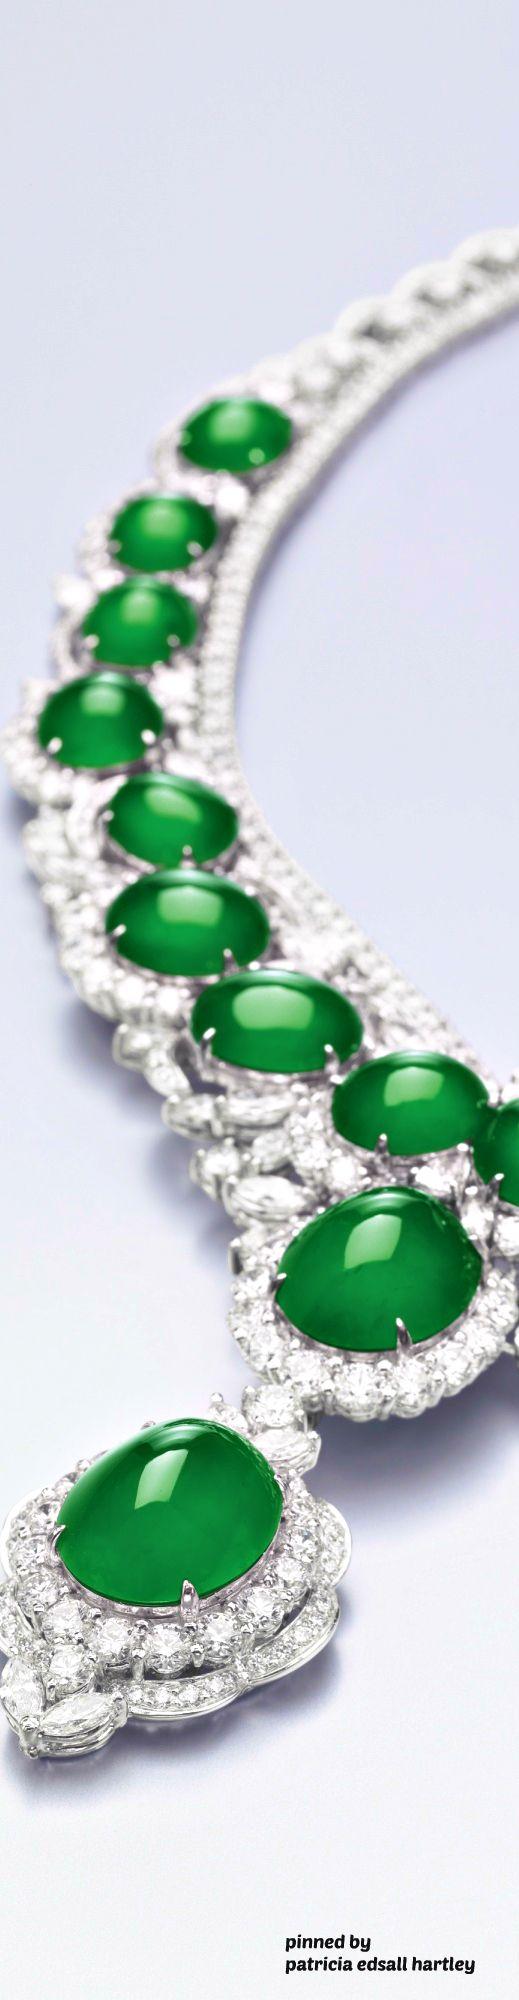 735 best Jade images on Pinterest | Jade jewelry, Gems and Gemstones